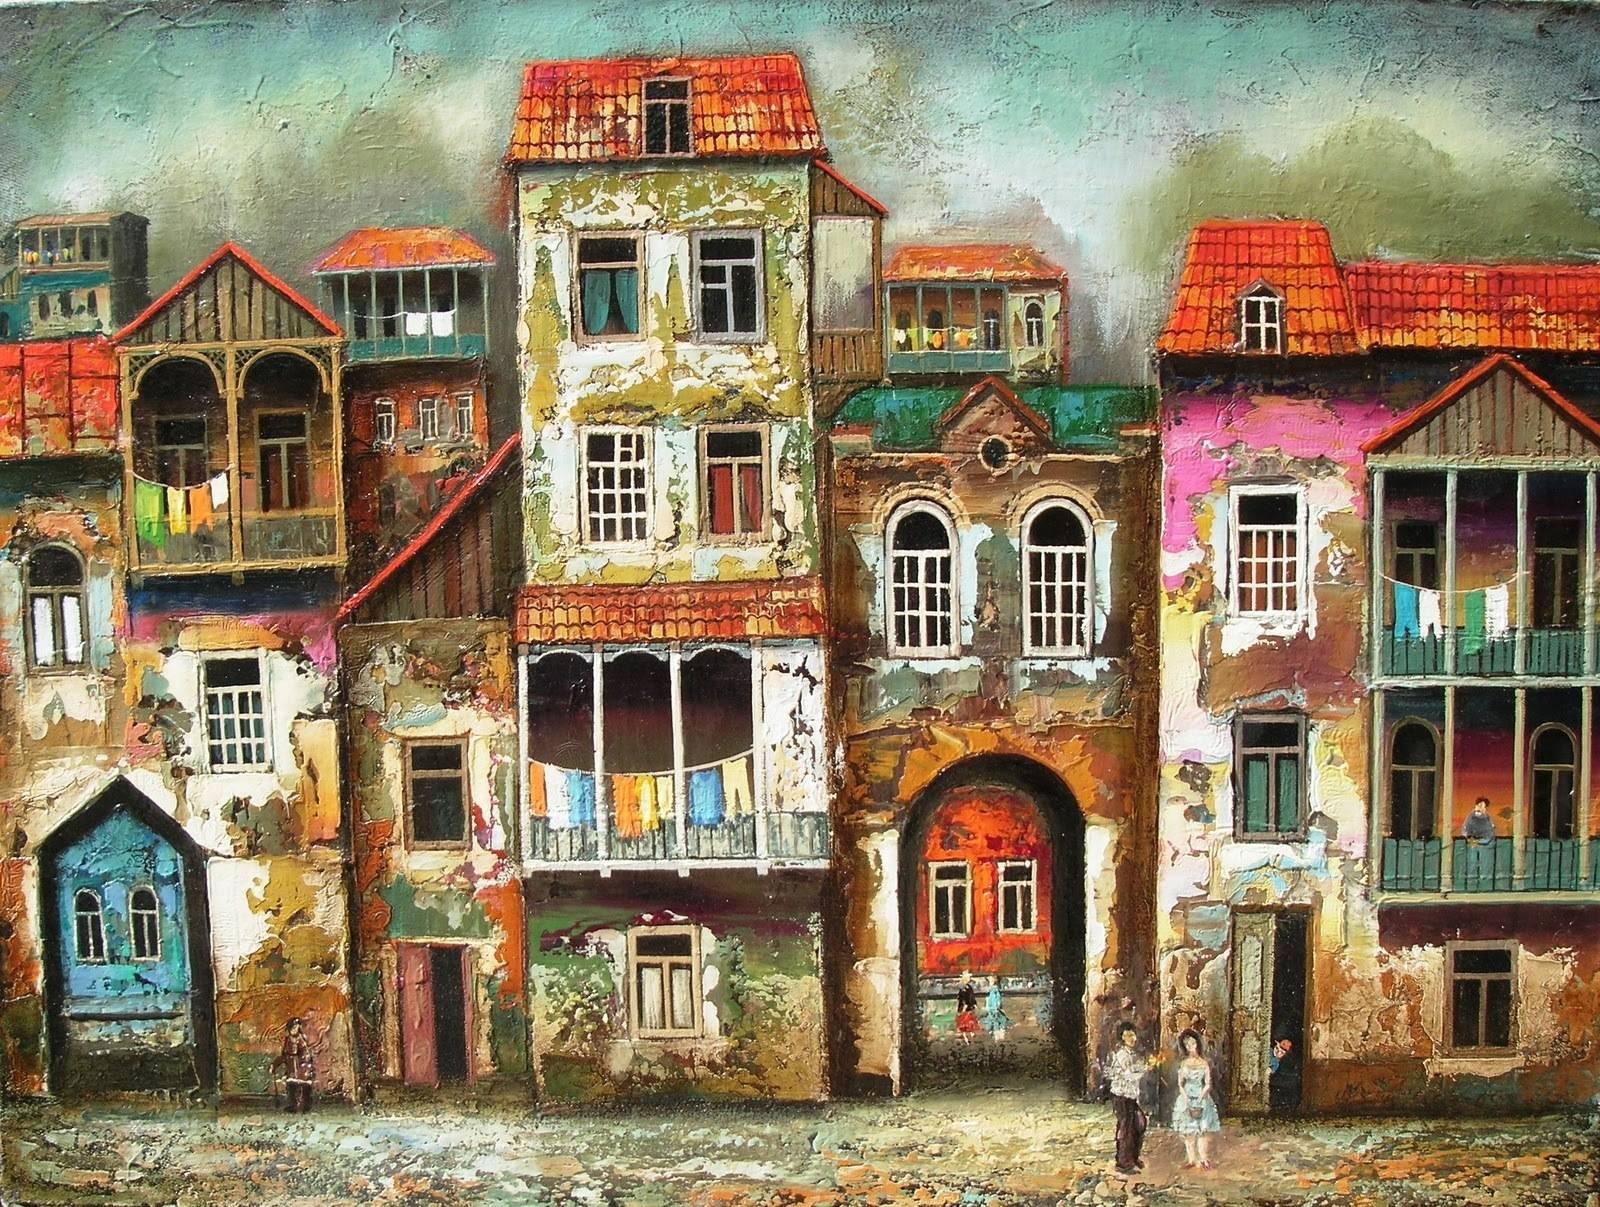 Арт грузинского художника Давида Мартиашвили: старый Тбилиси